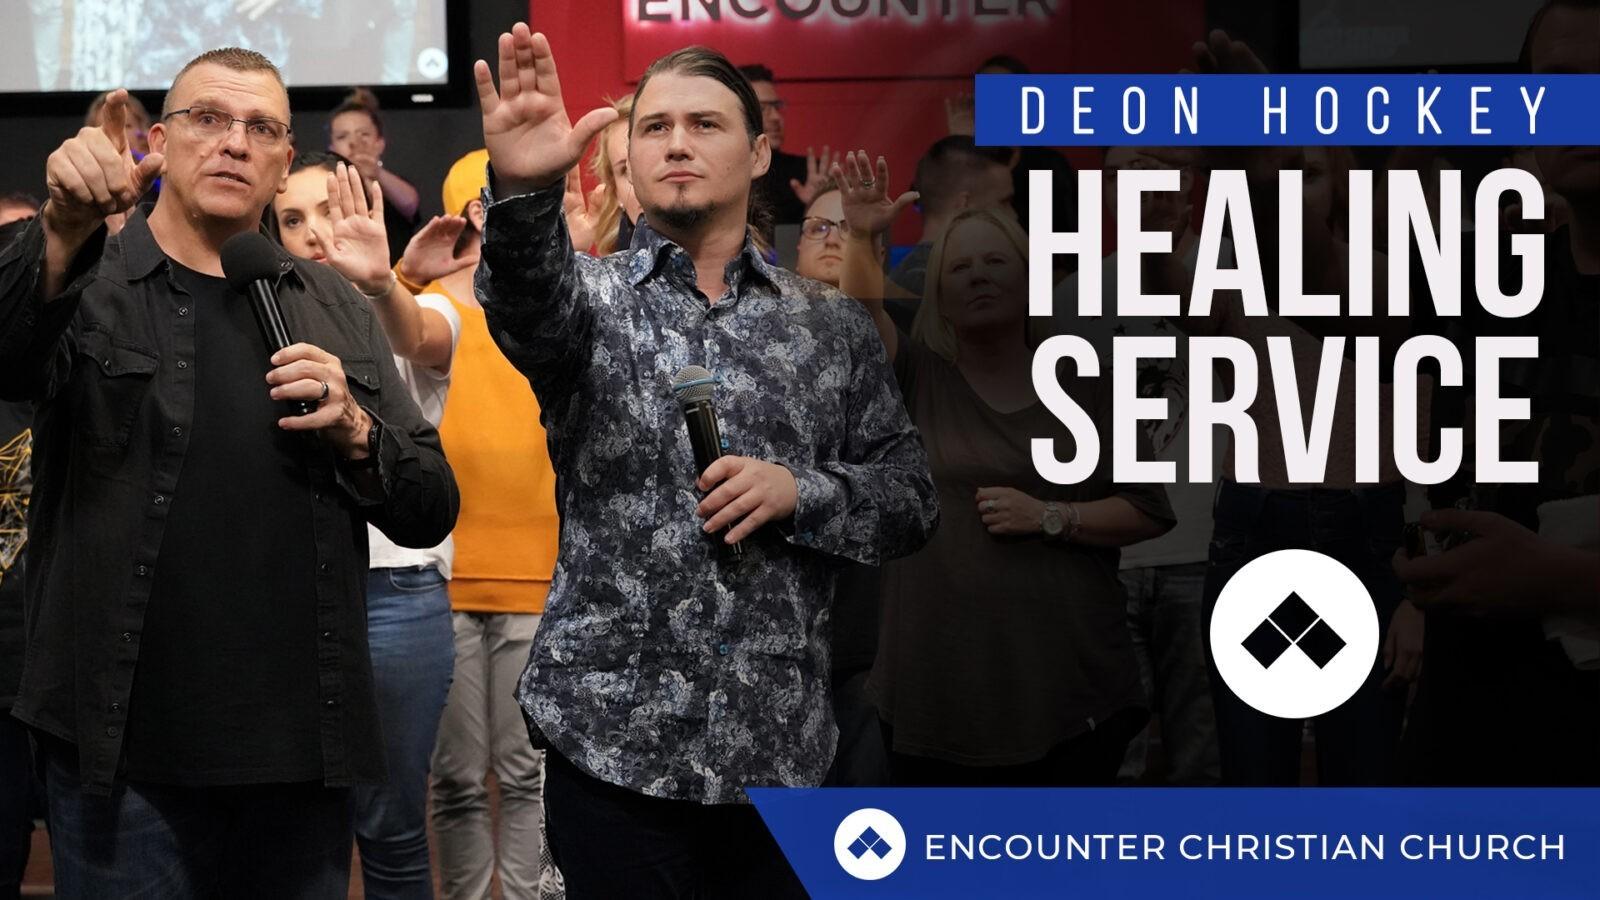 Deon Hockey – Healing Service